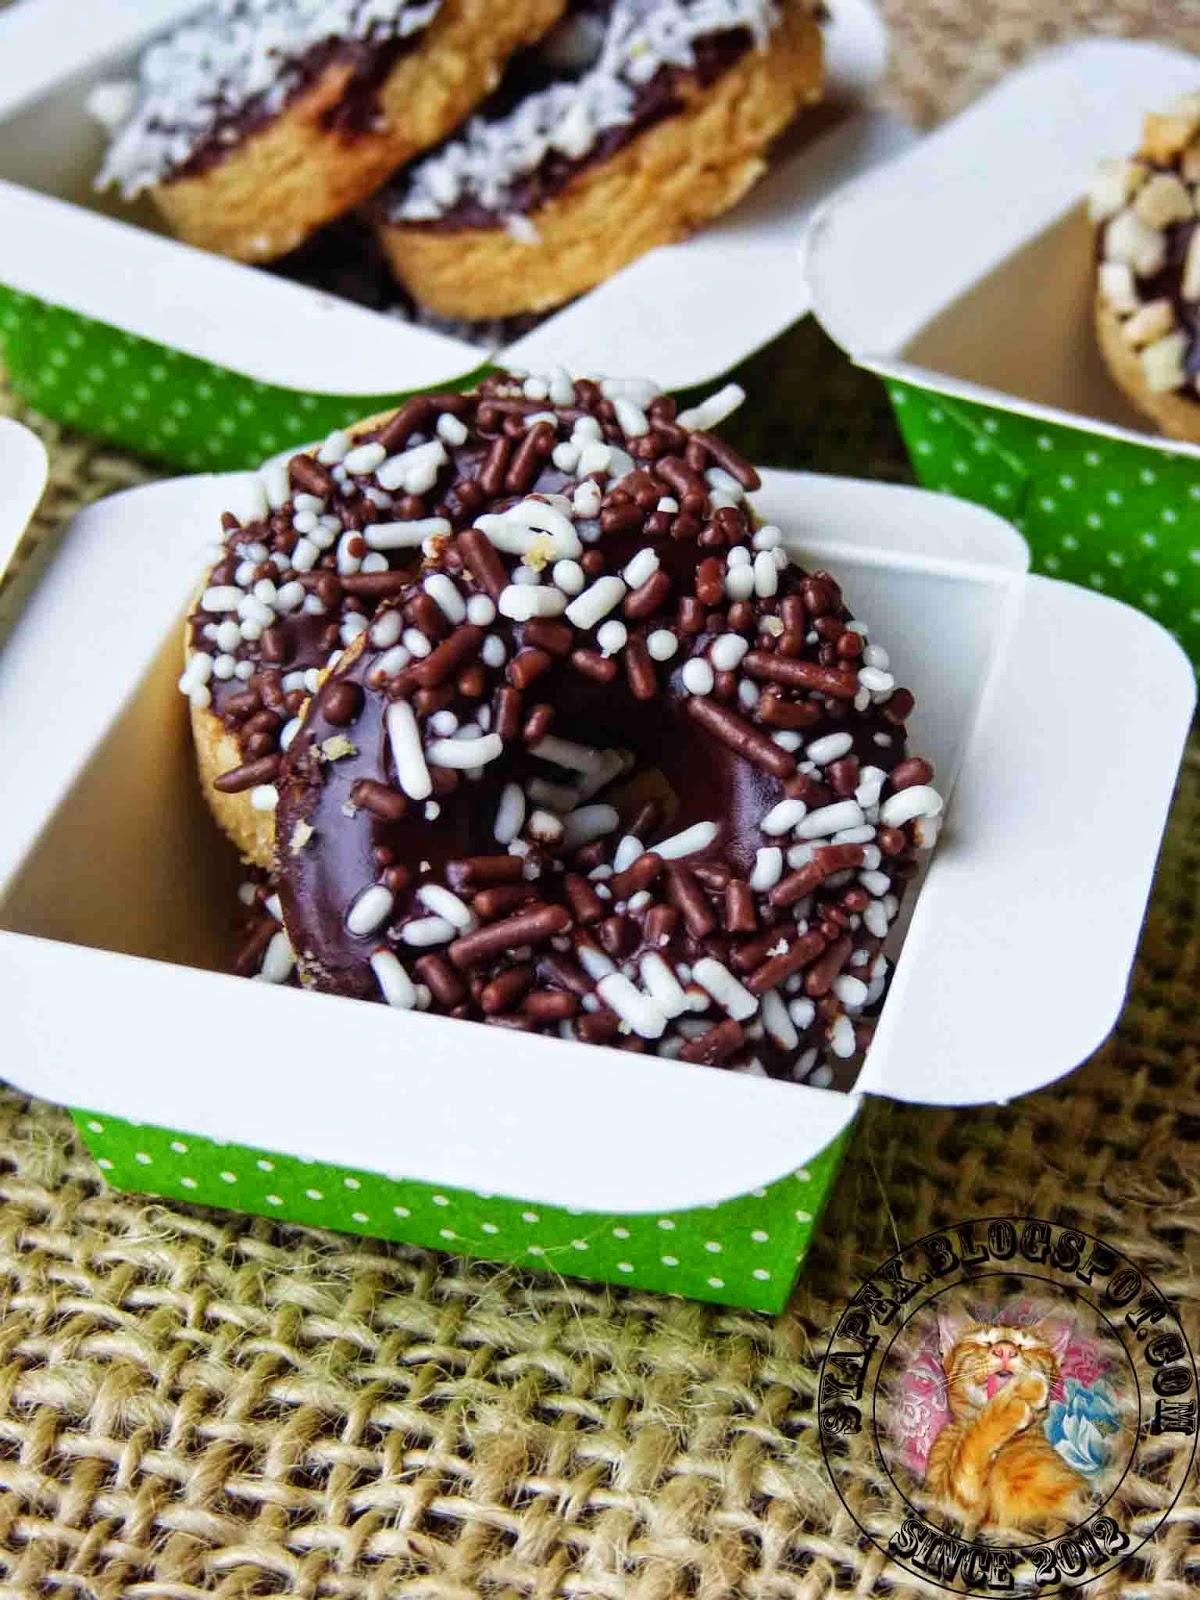 syapex kitchen: Biskut Donut